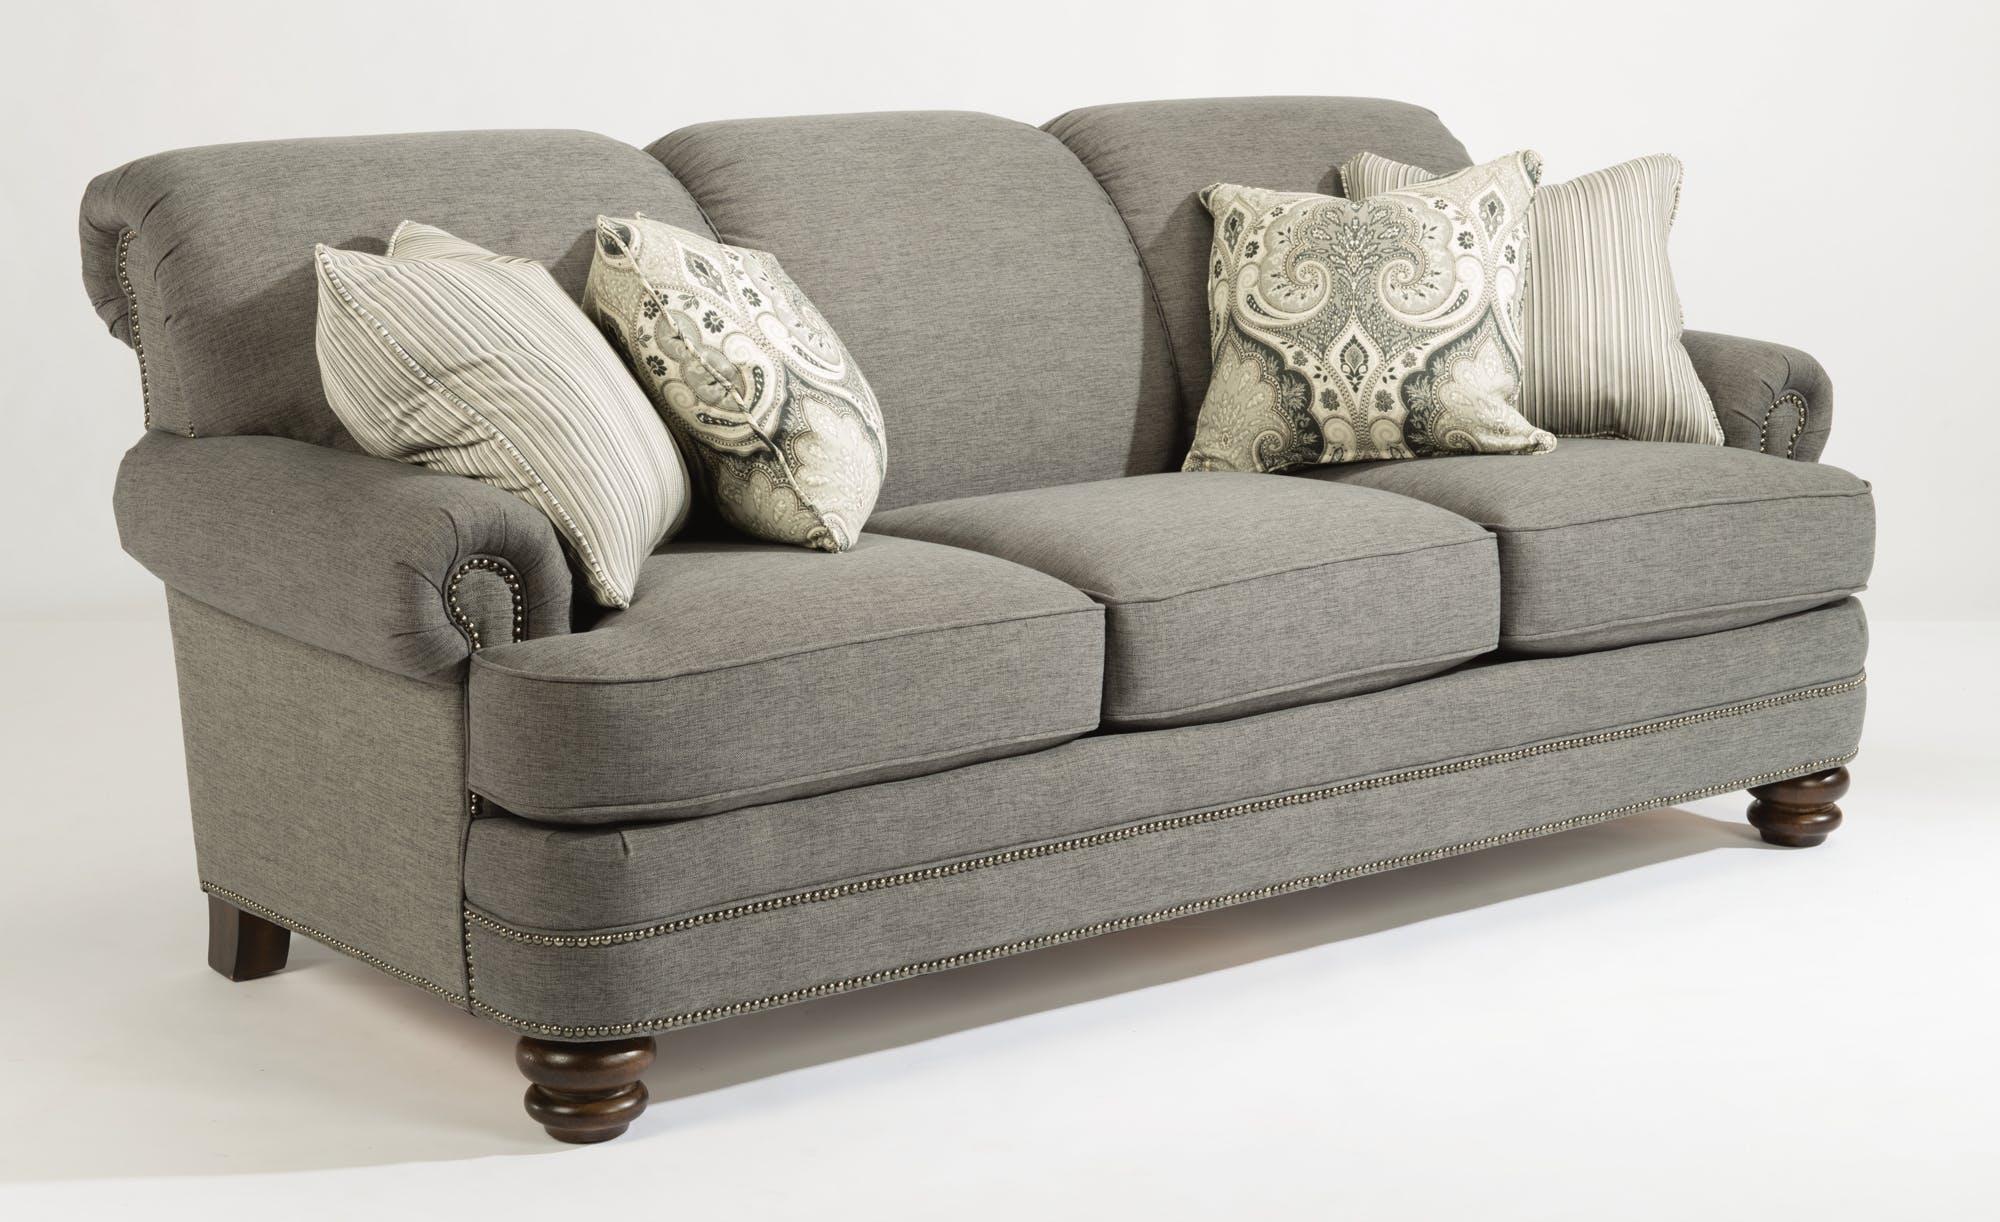 flexsteel sofas flexsteel sofa with pillows 657955 FFLWAFT